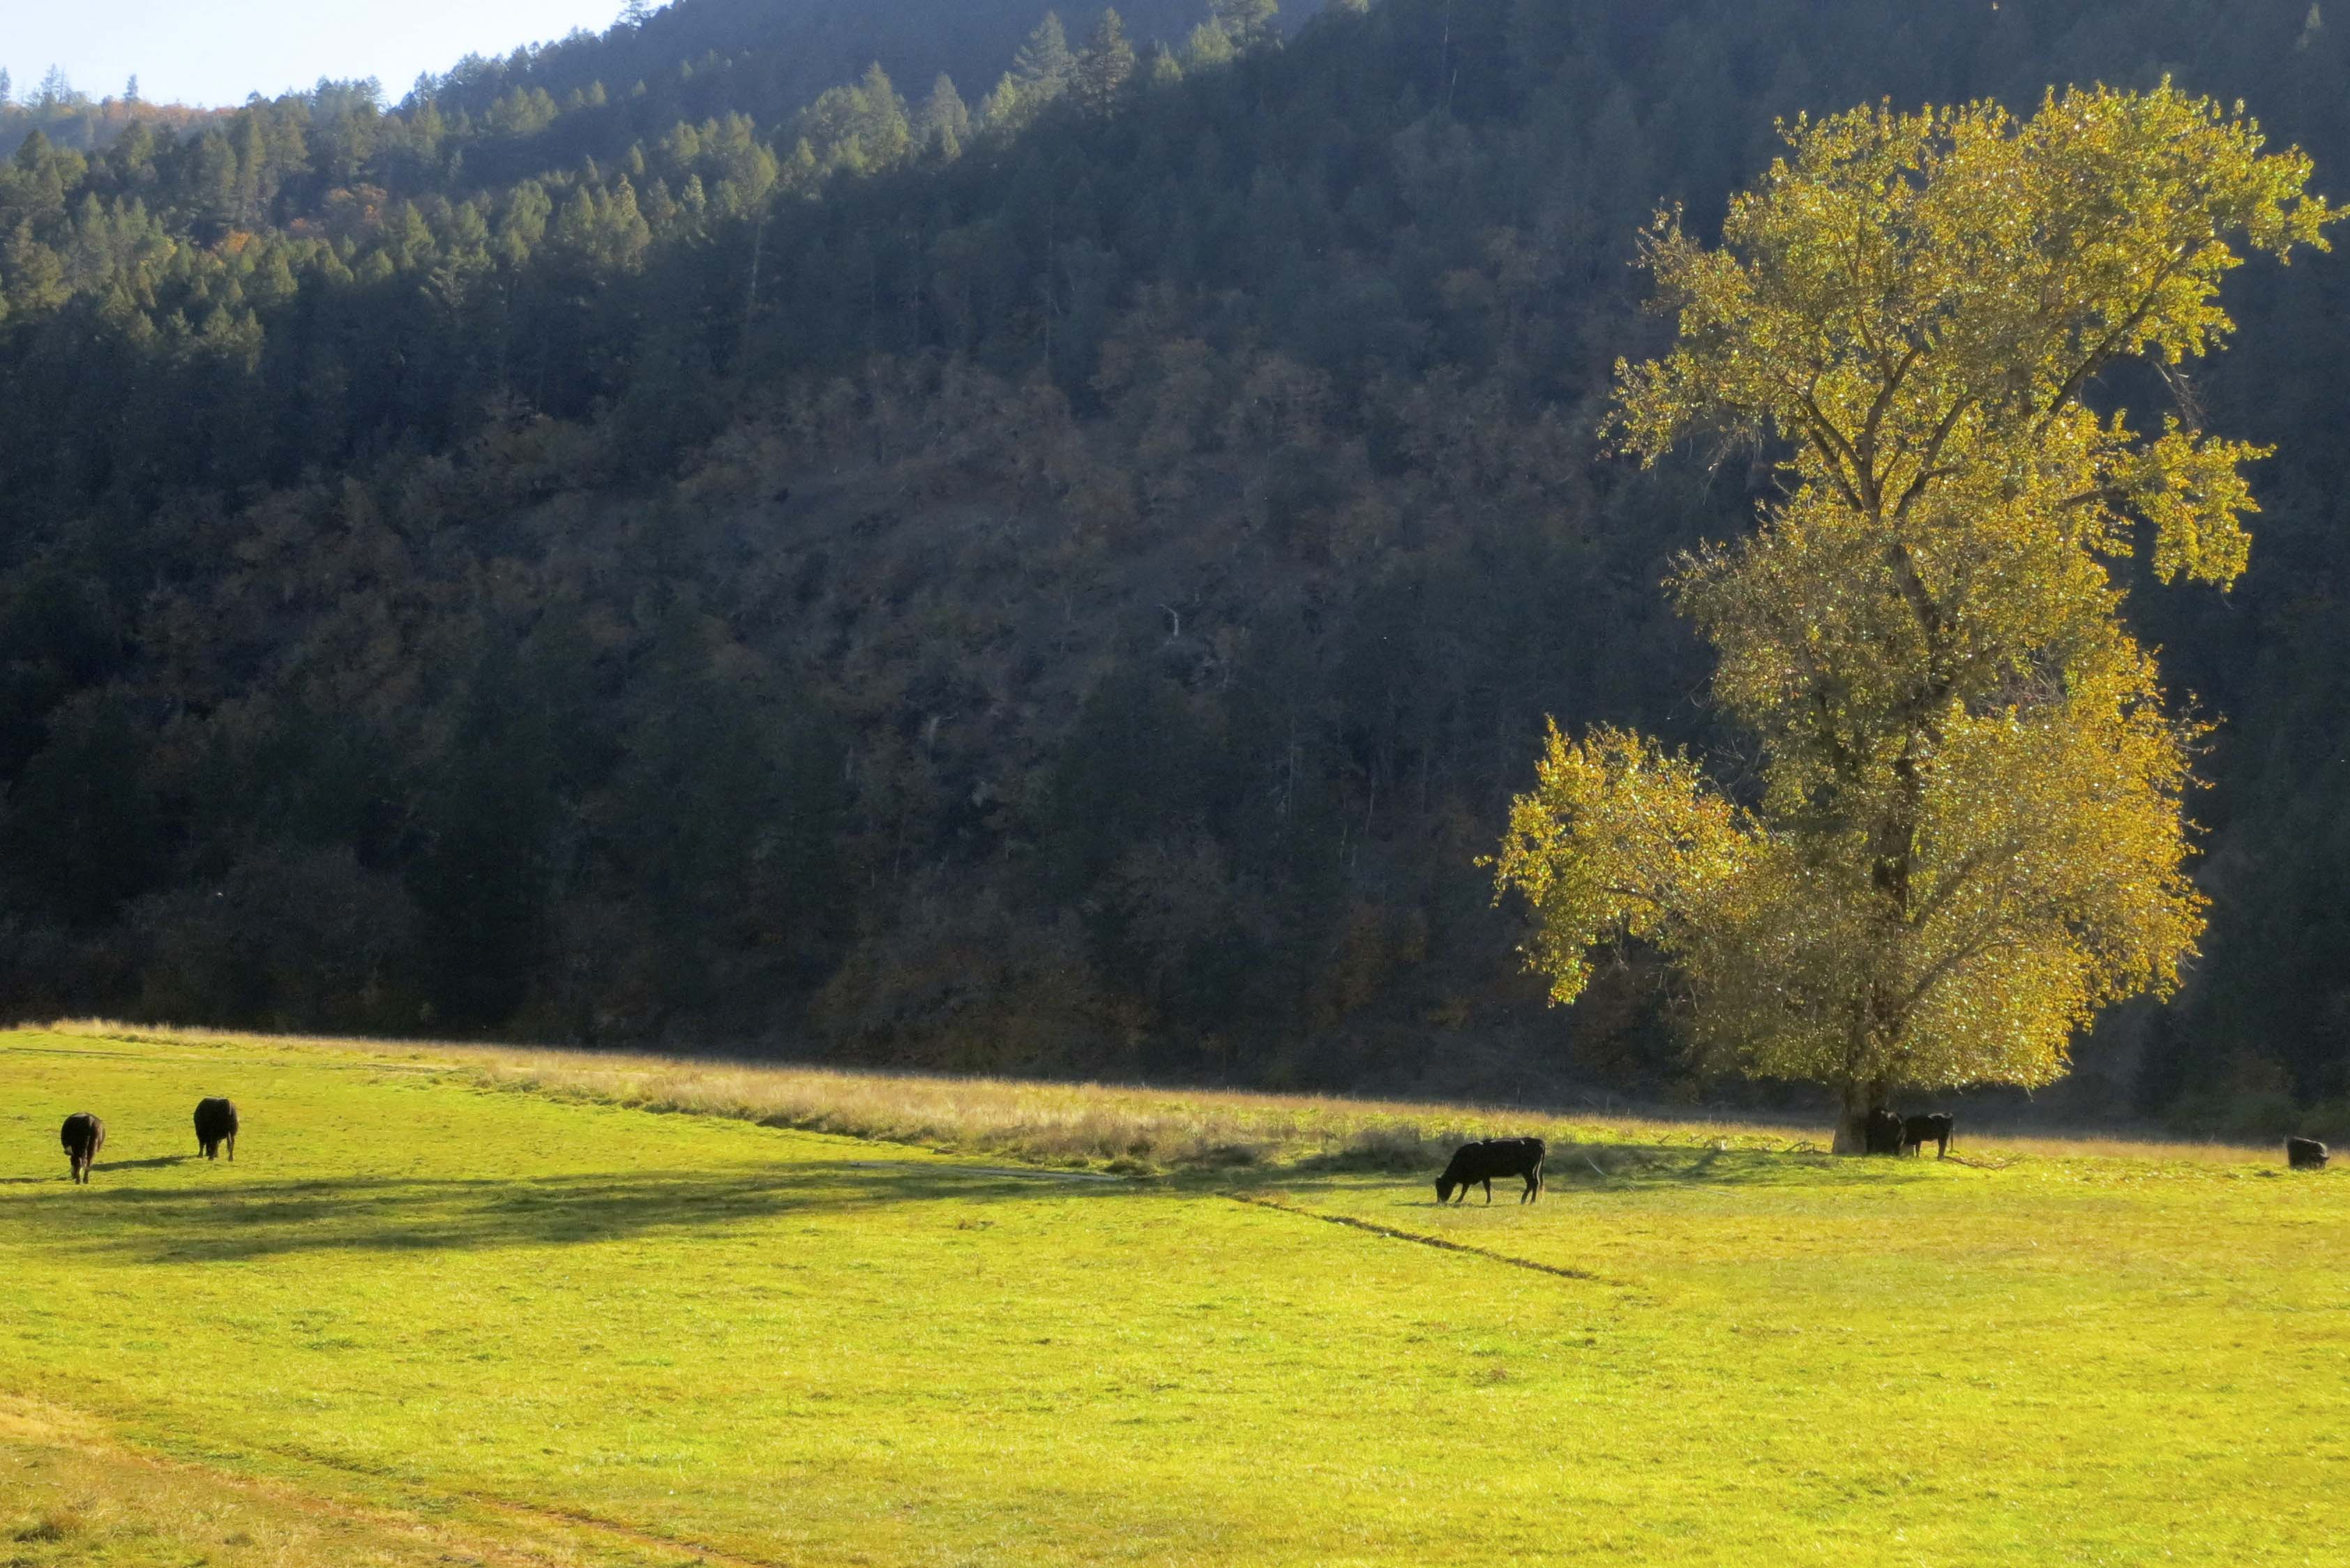 Photo along Upper Applegate Road in Southern Oregon by Curtis Mekemson.